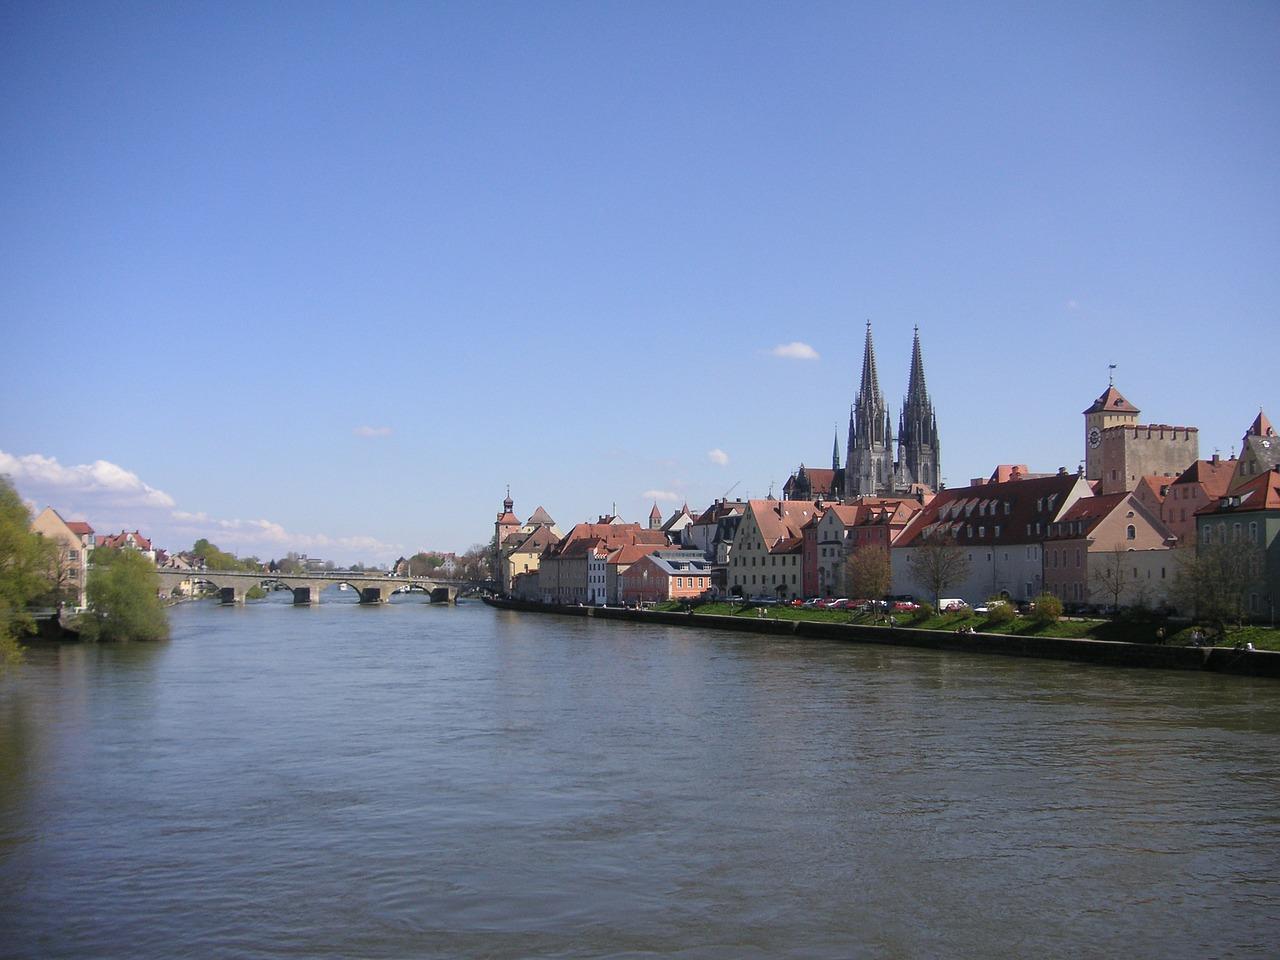 Регенсбург и монастырь Вельтенбург